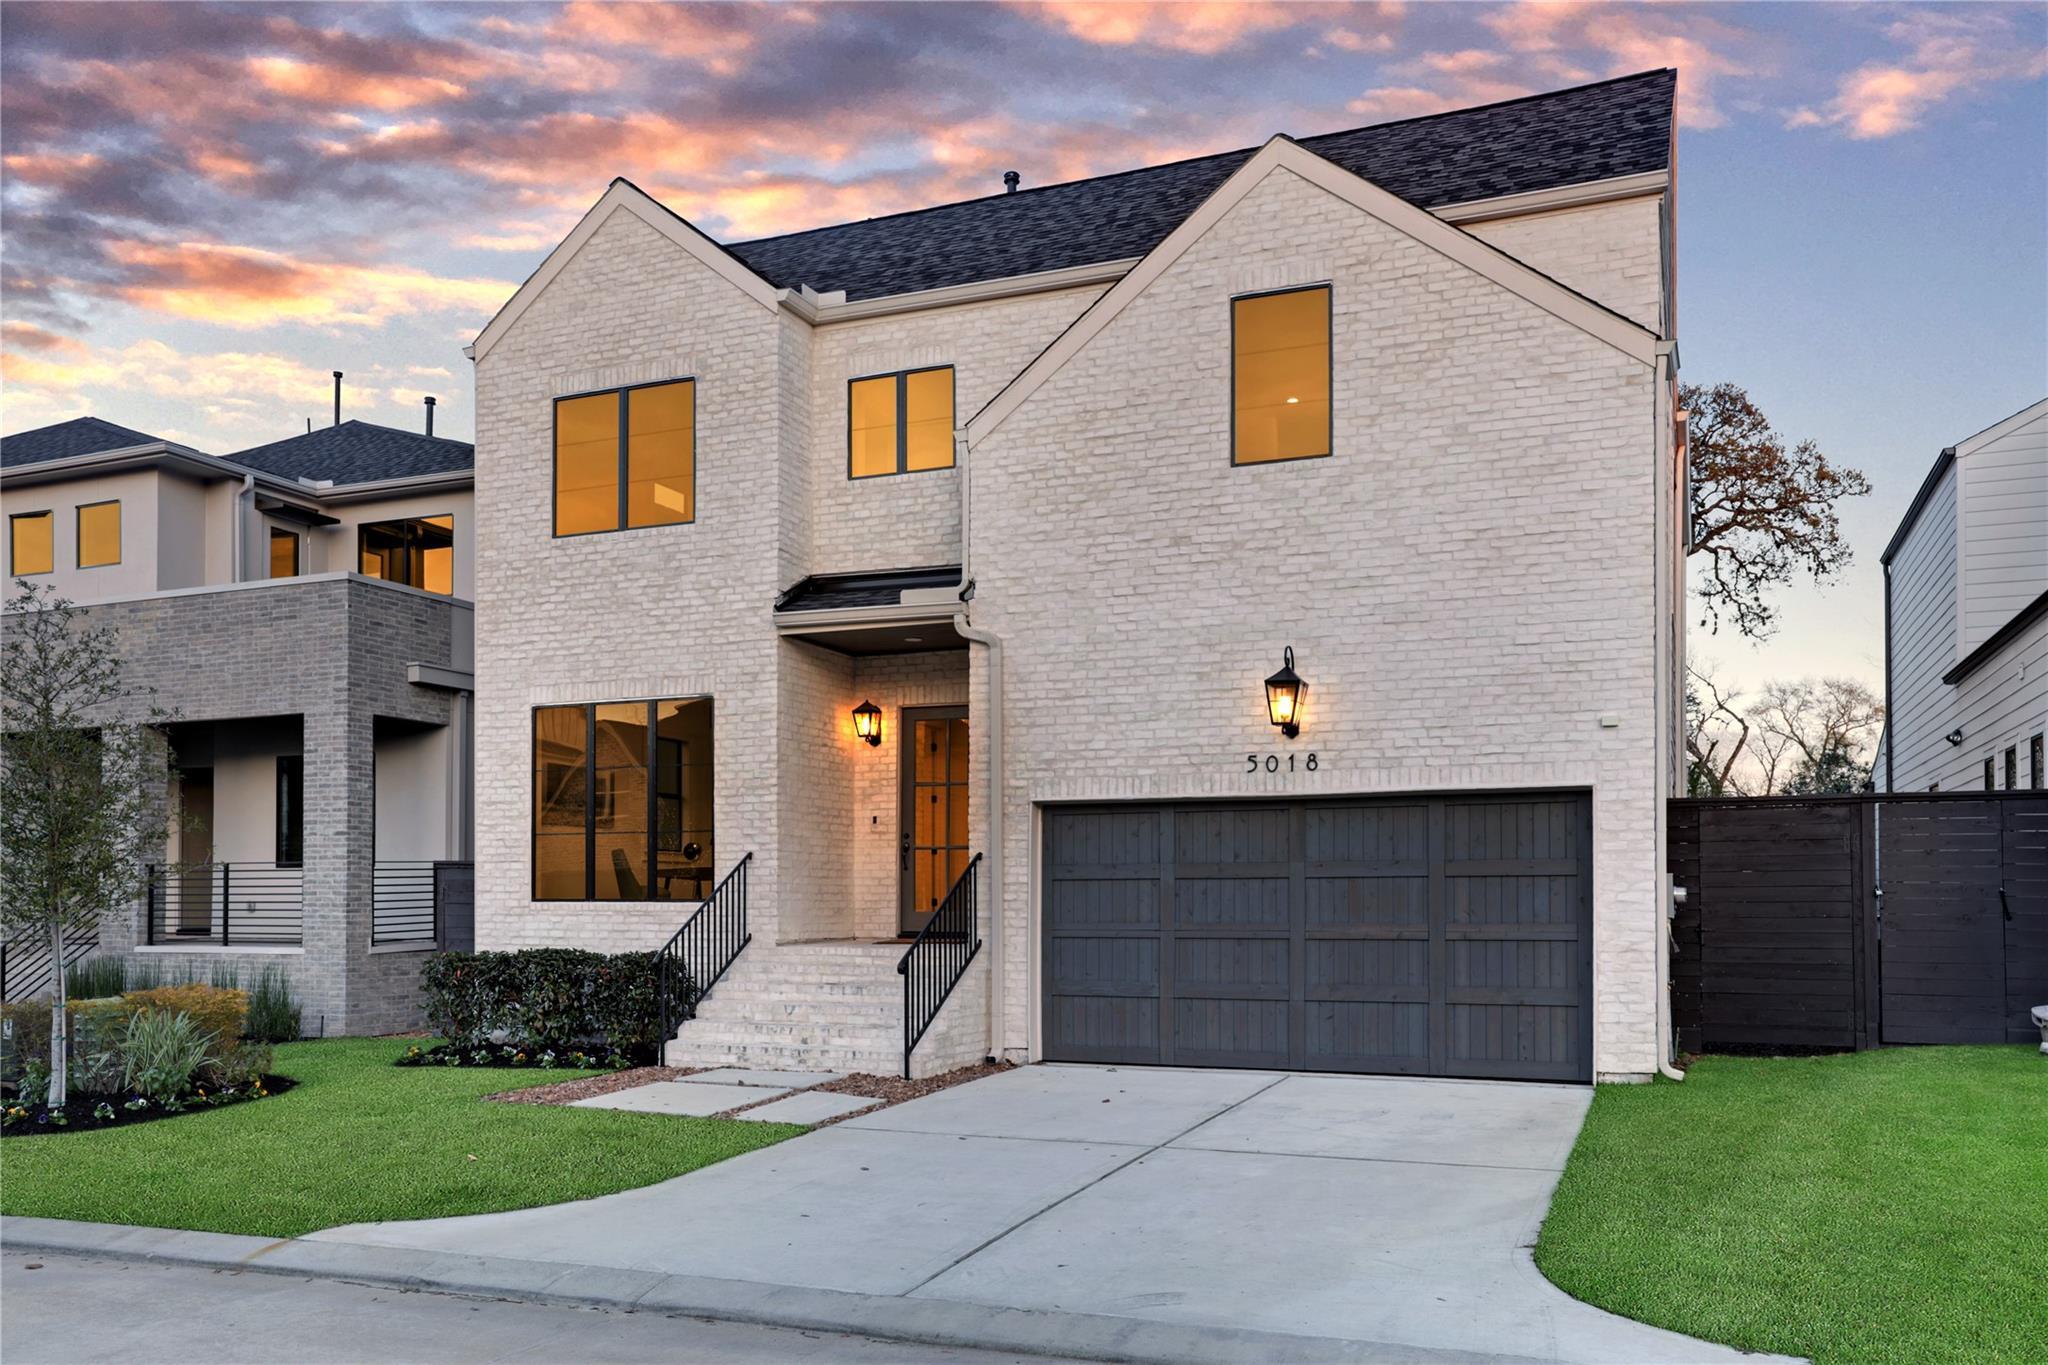 5018 Bayou Ridge Drive Property Photo - Houston, TX real estate listing